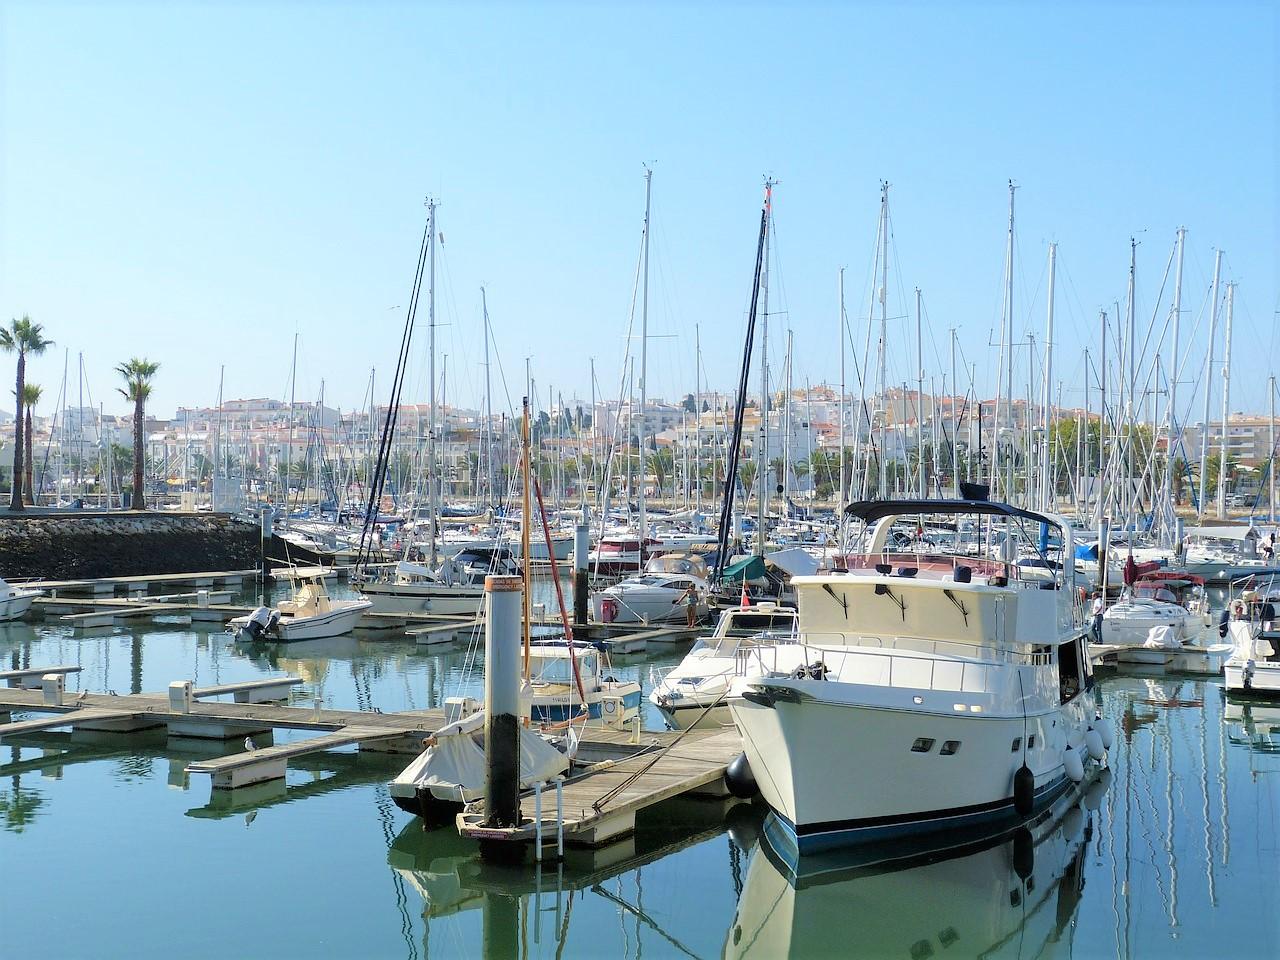 Lagos Marina, Algarve